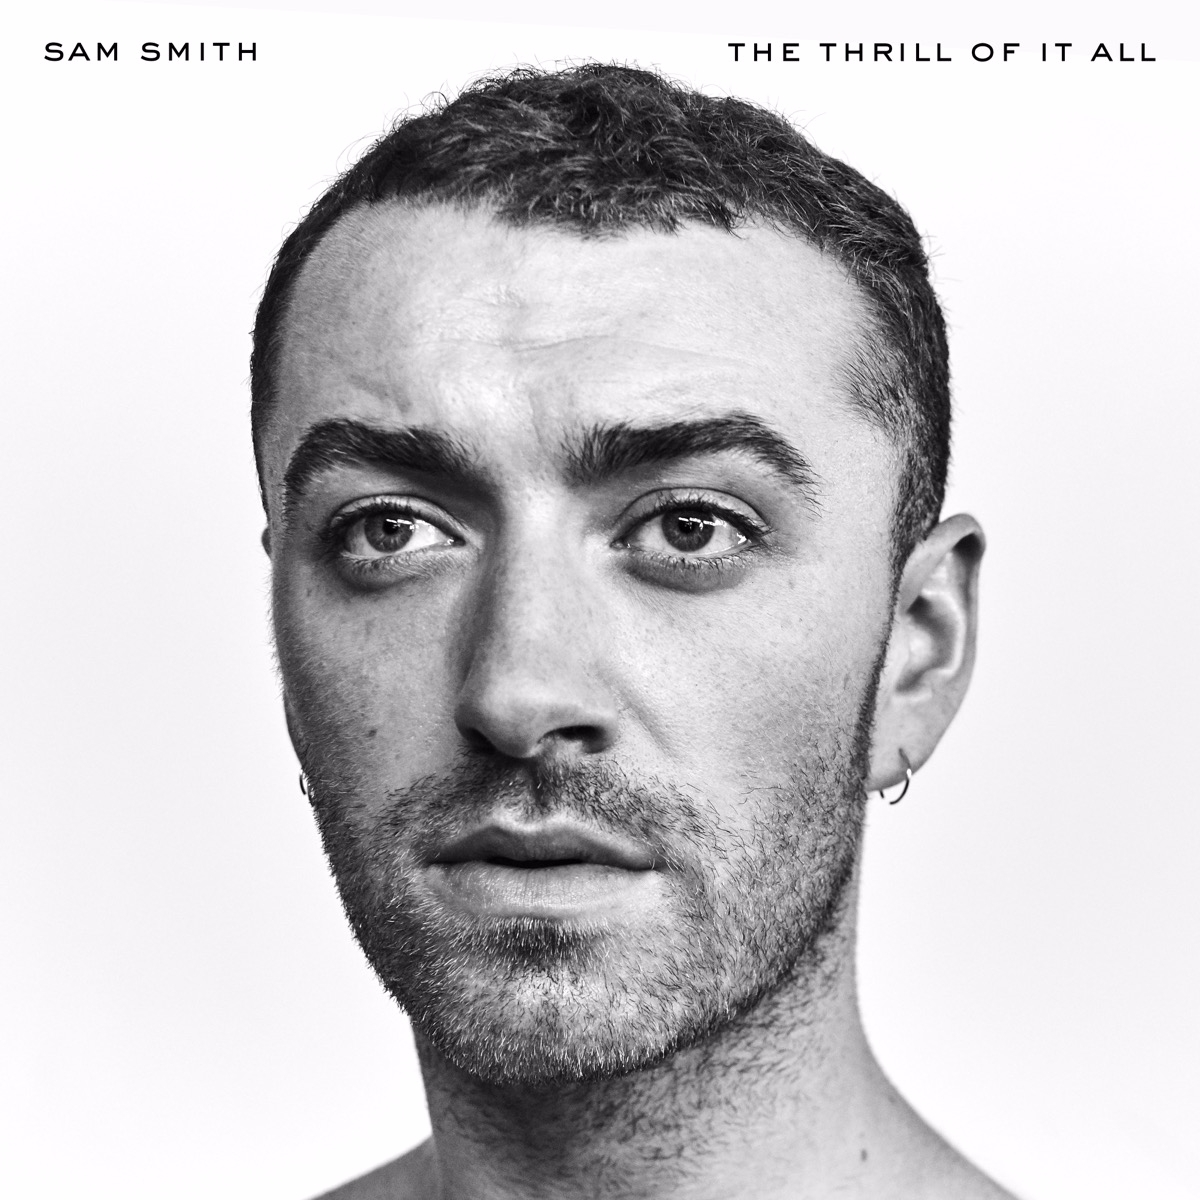 Sam Smith announces album North - alexyoung231 | ello